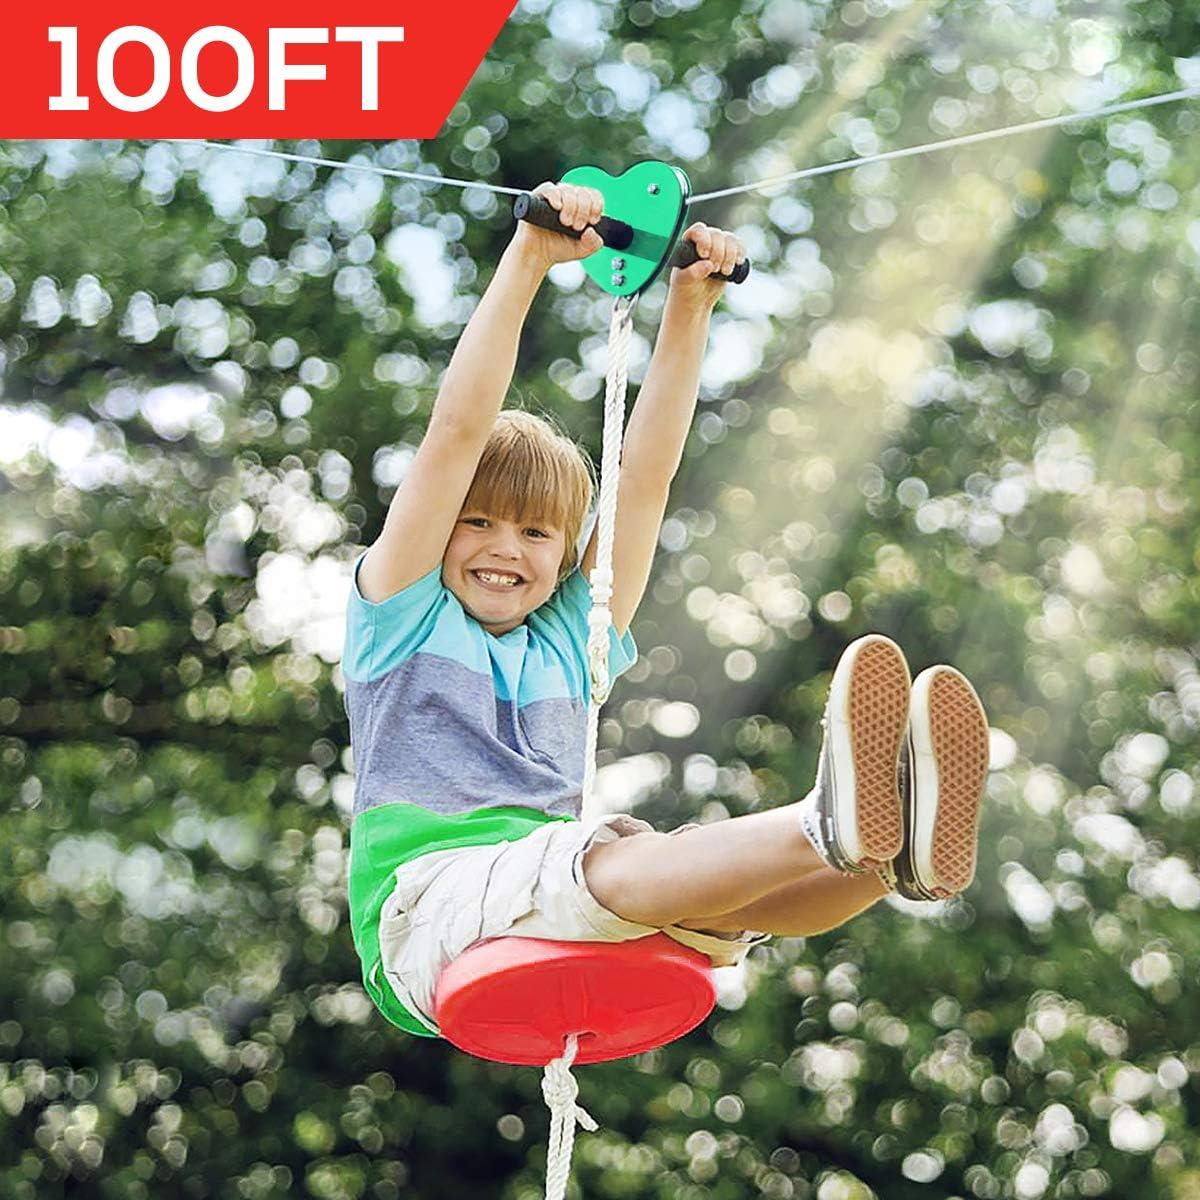 Hi-Na Zip Line Kit 80ft 100ft 120ft Zipline Kits for Backyard Kids Play Set Zipline with Seat Handles Ziplines for Backyards Zipline 100 Foot Zip Line Kit Zip Line Play Set Zipline for Kids (100ft)